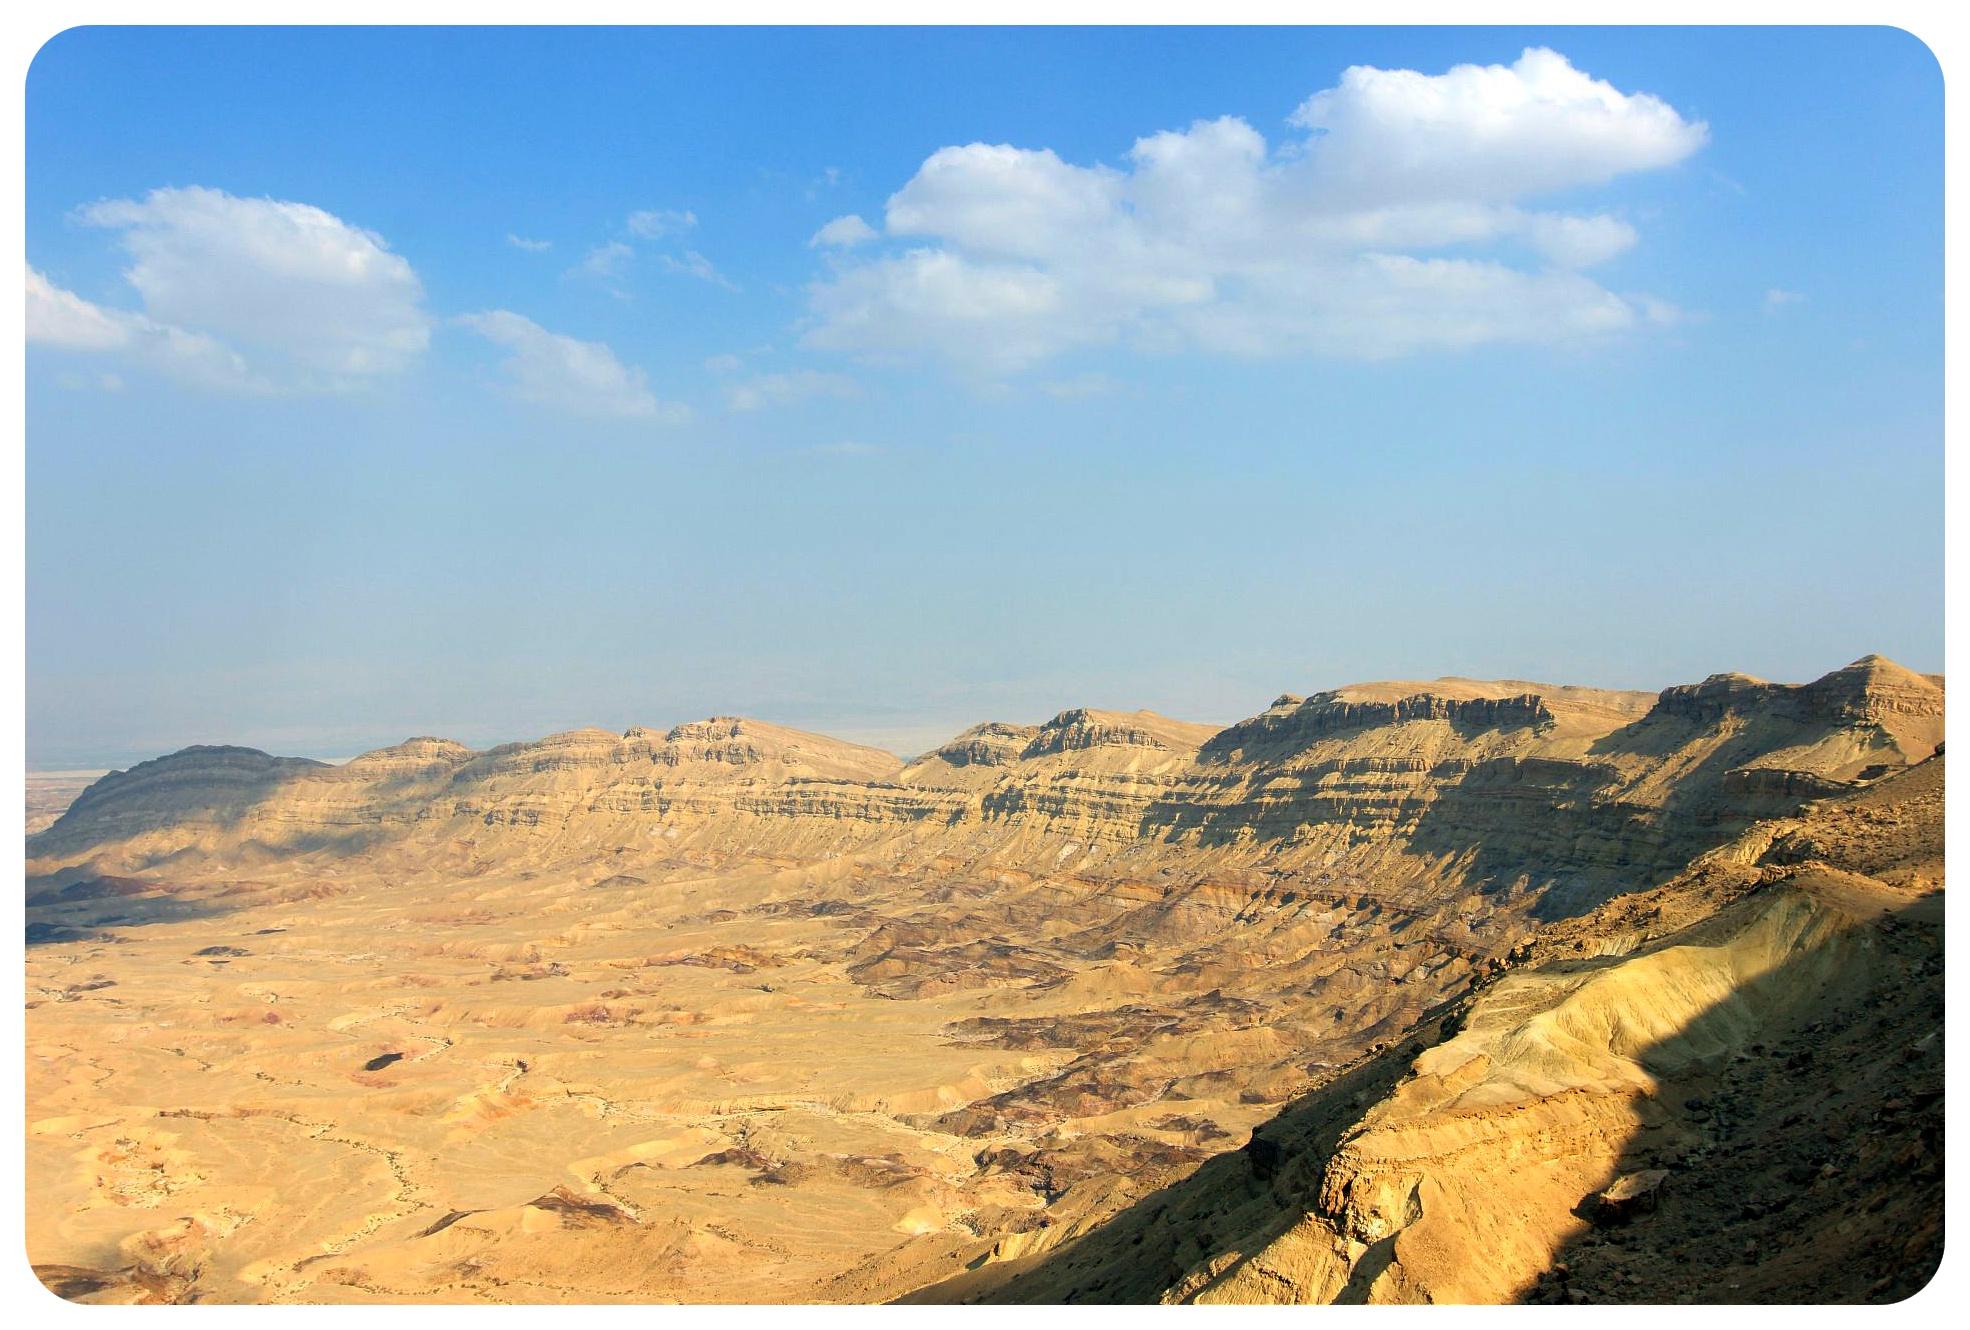 makhtesh katan crater israel negev desert